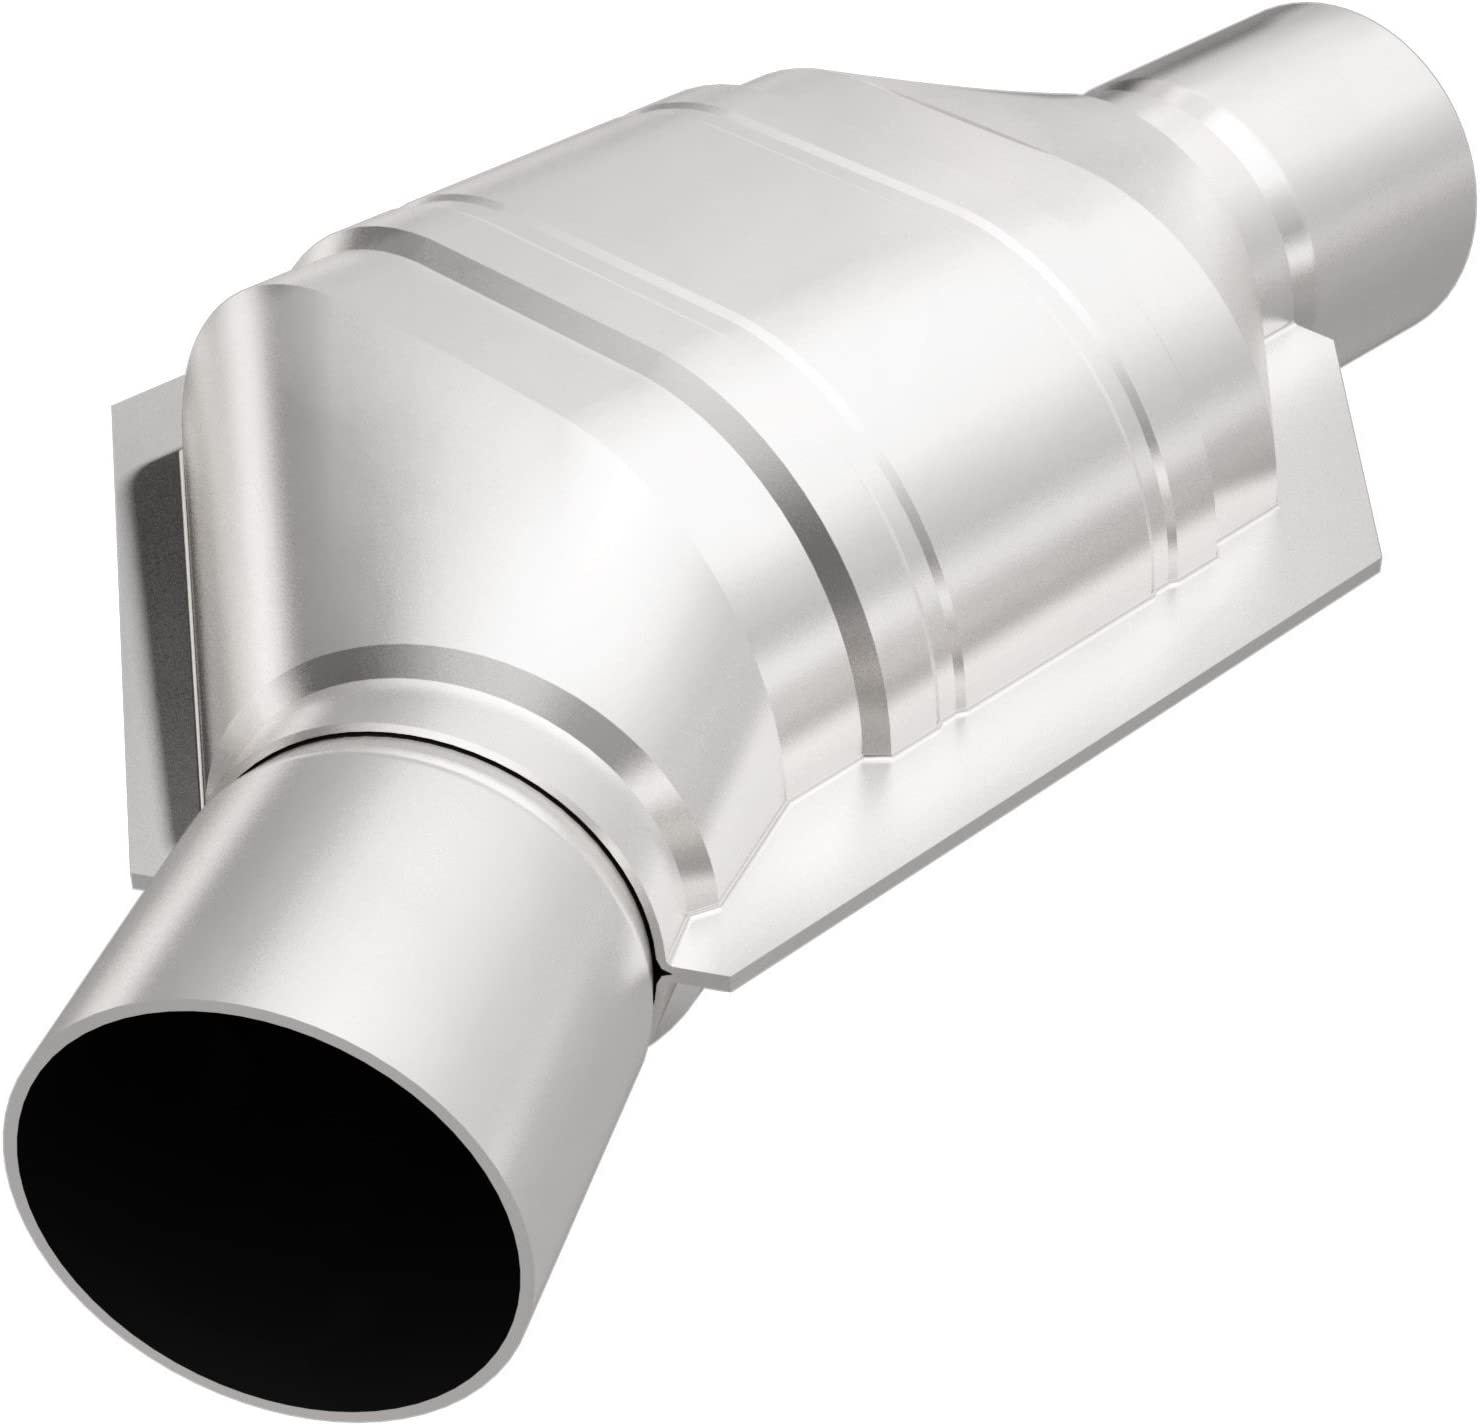 MagnaFlow California Converter 447206 Universal California Catalytic Converter